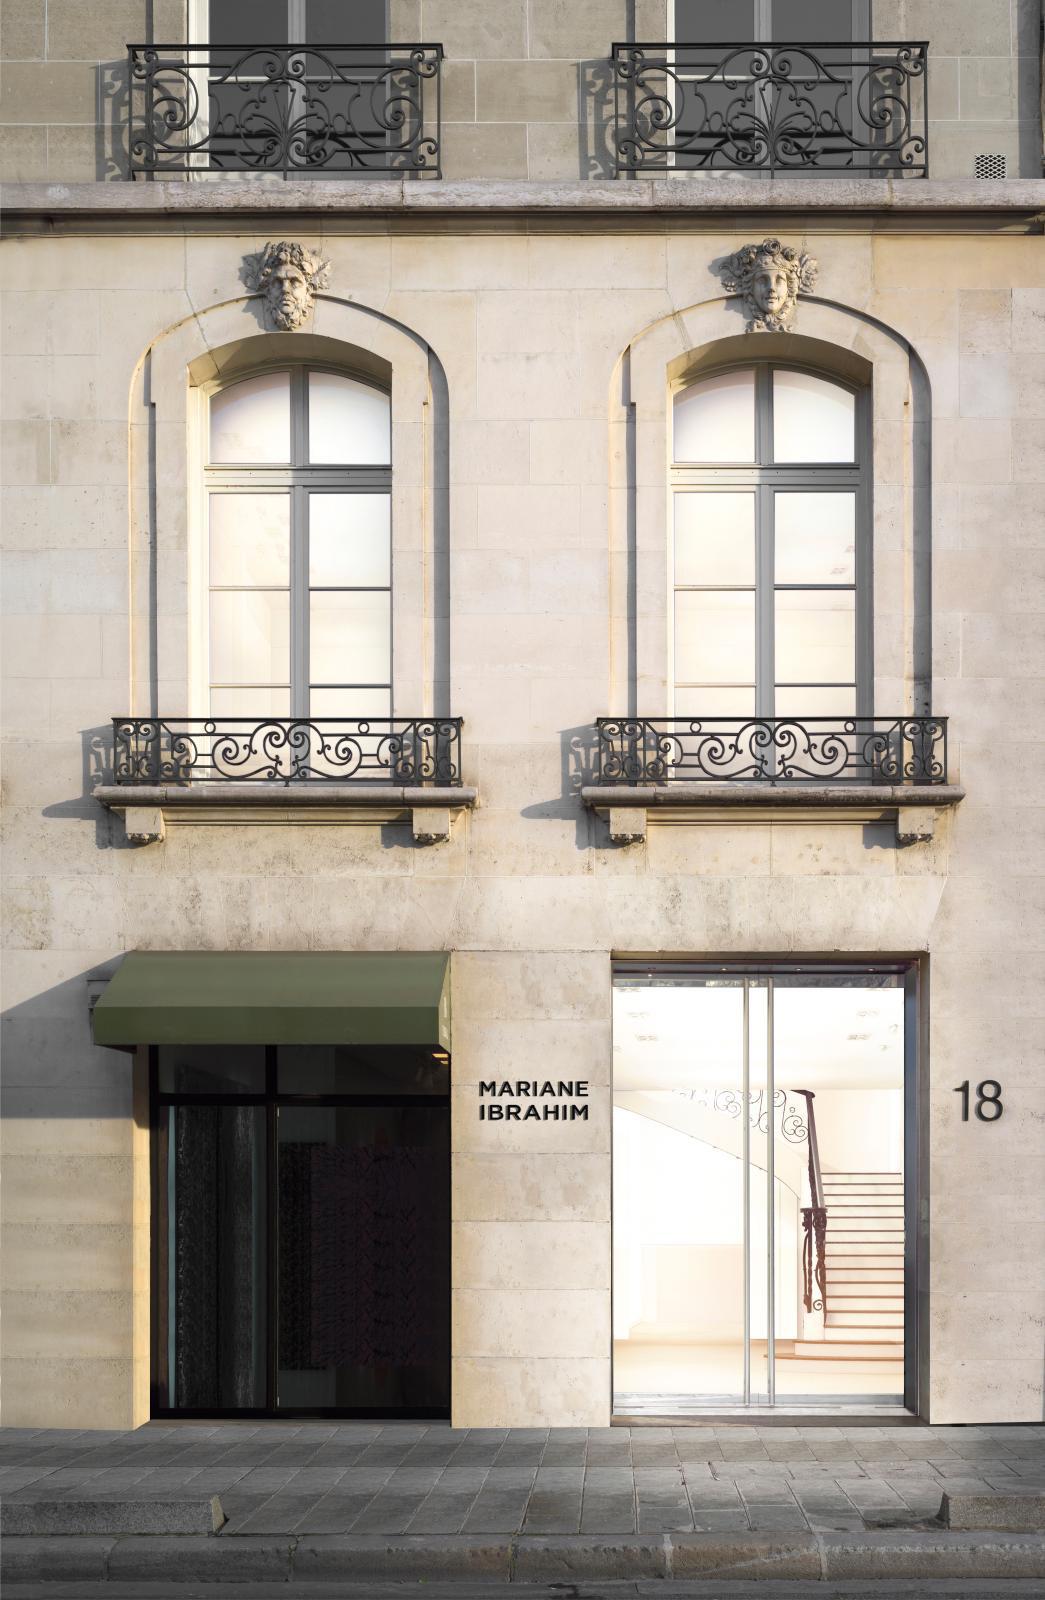 The Mariane Ibrahim gallery at 18 Avenue Matignon.Courtesy Mariane Ibrahim